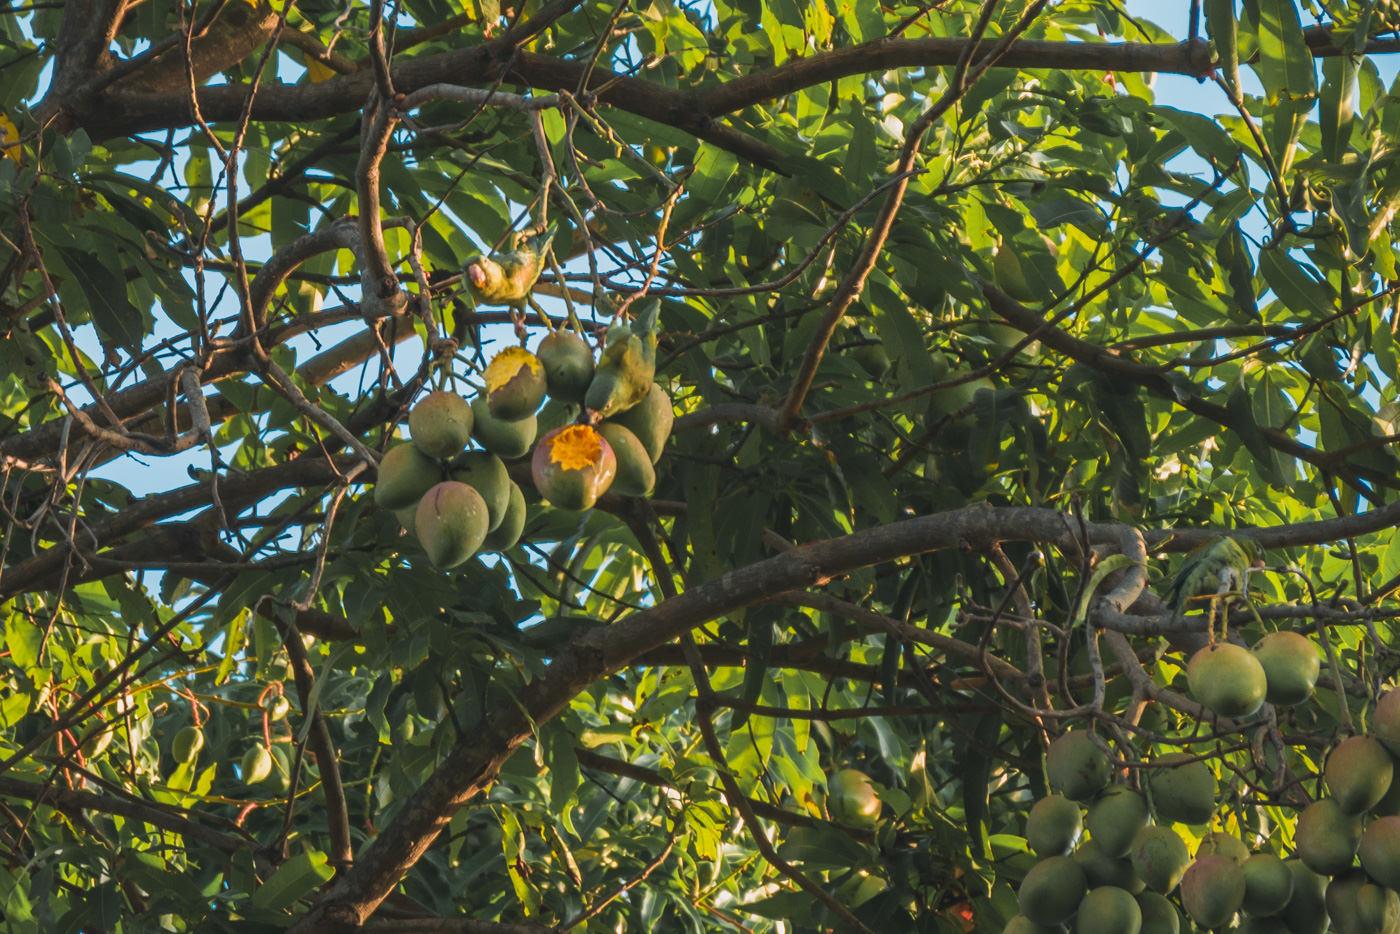 Vögel im Mangobaum in Nicaragua